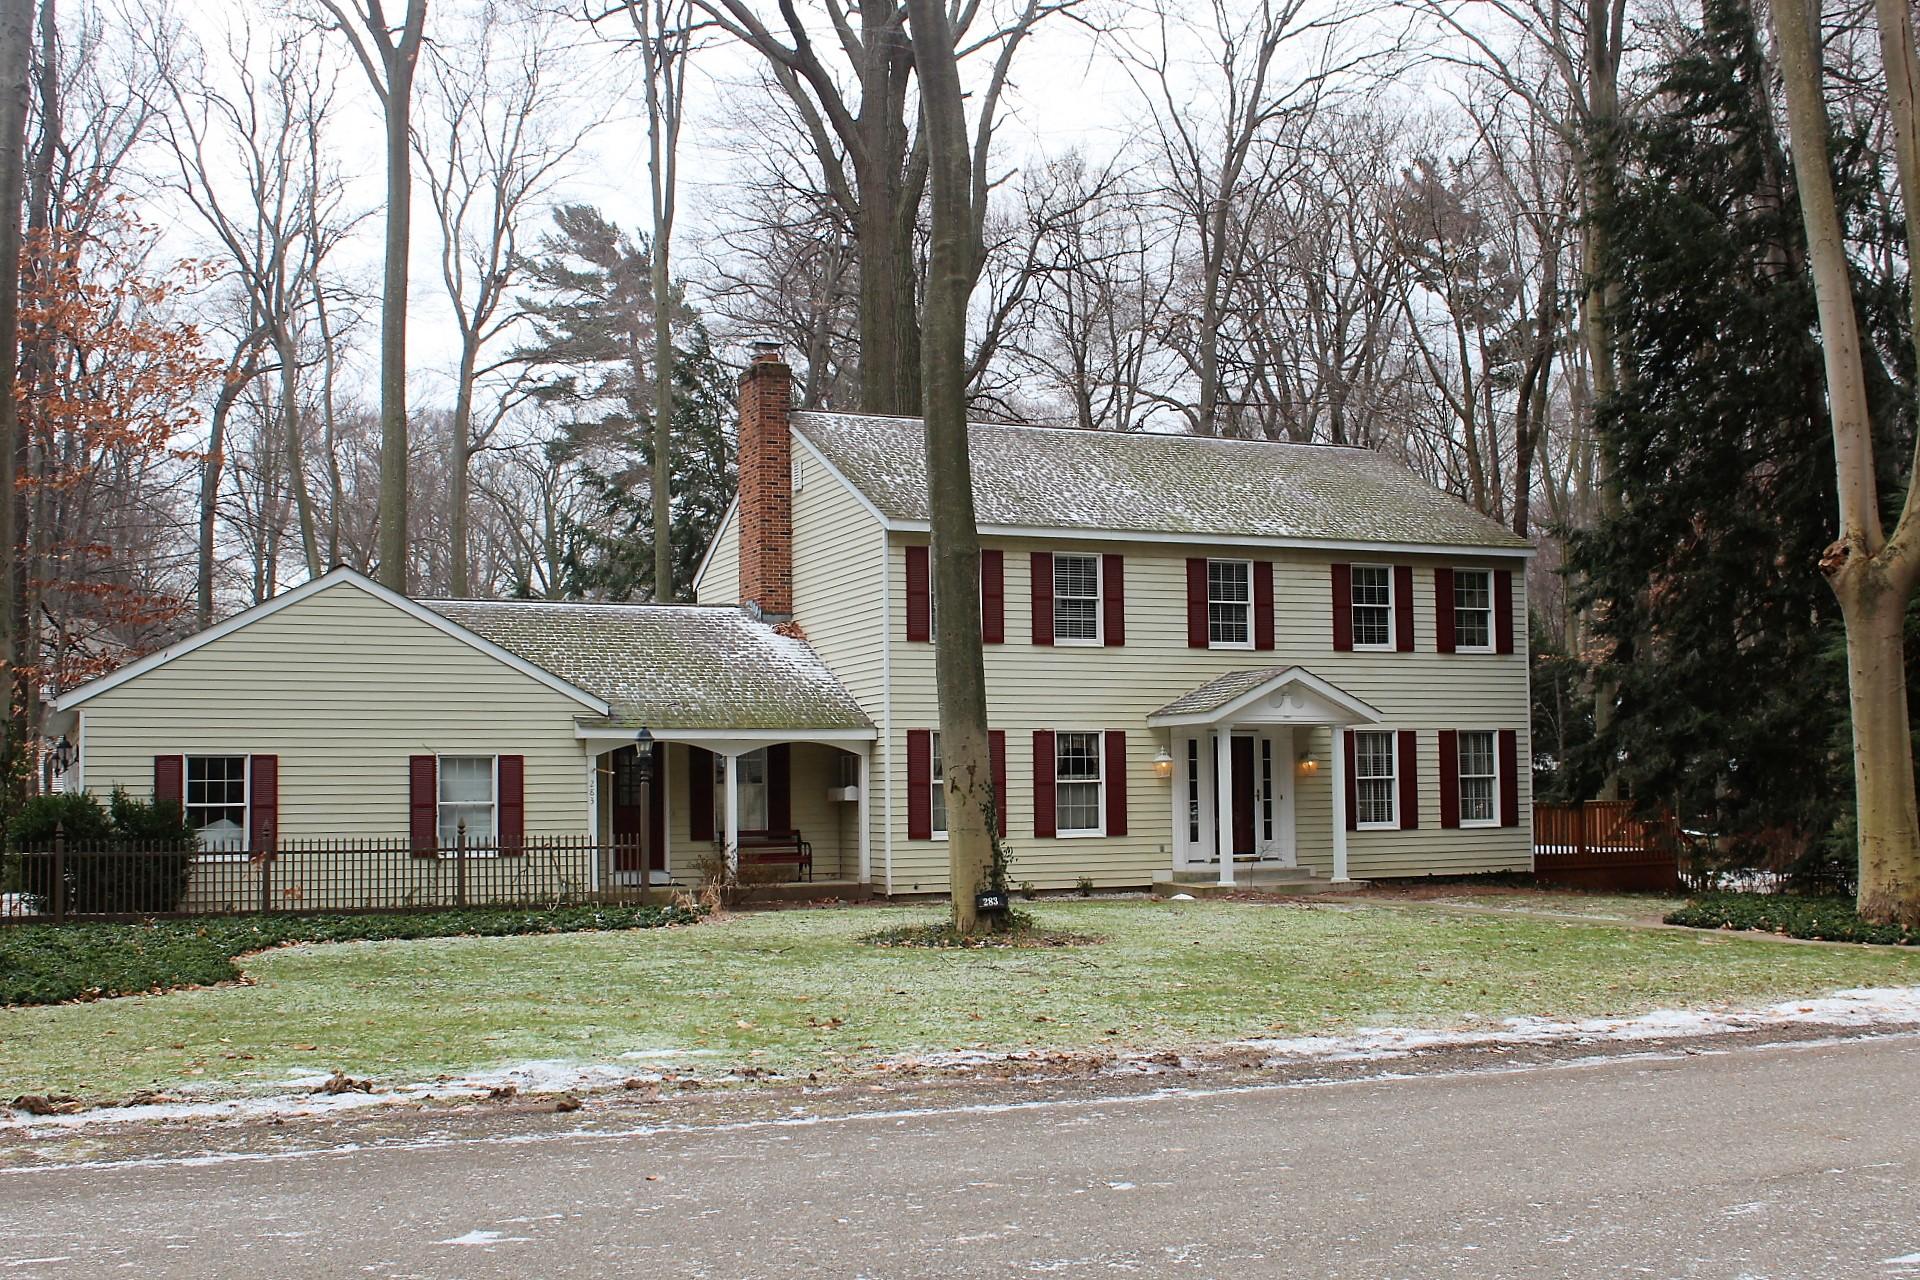 其它住宅 为 销售 在 Wooded Colonial Retreat 283 Portchester 霍德兰, 密歇根州, 49424 美国